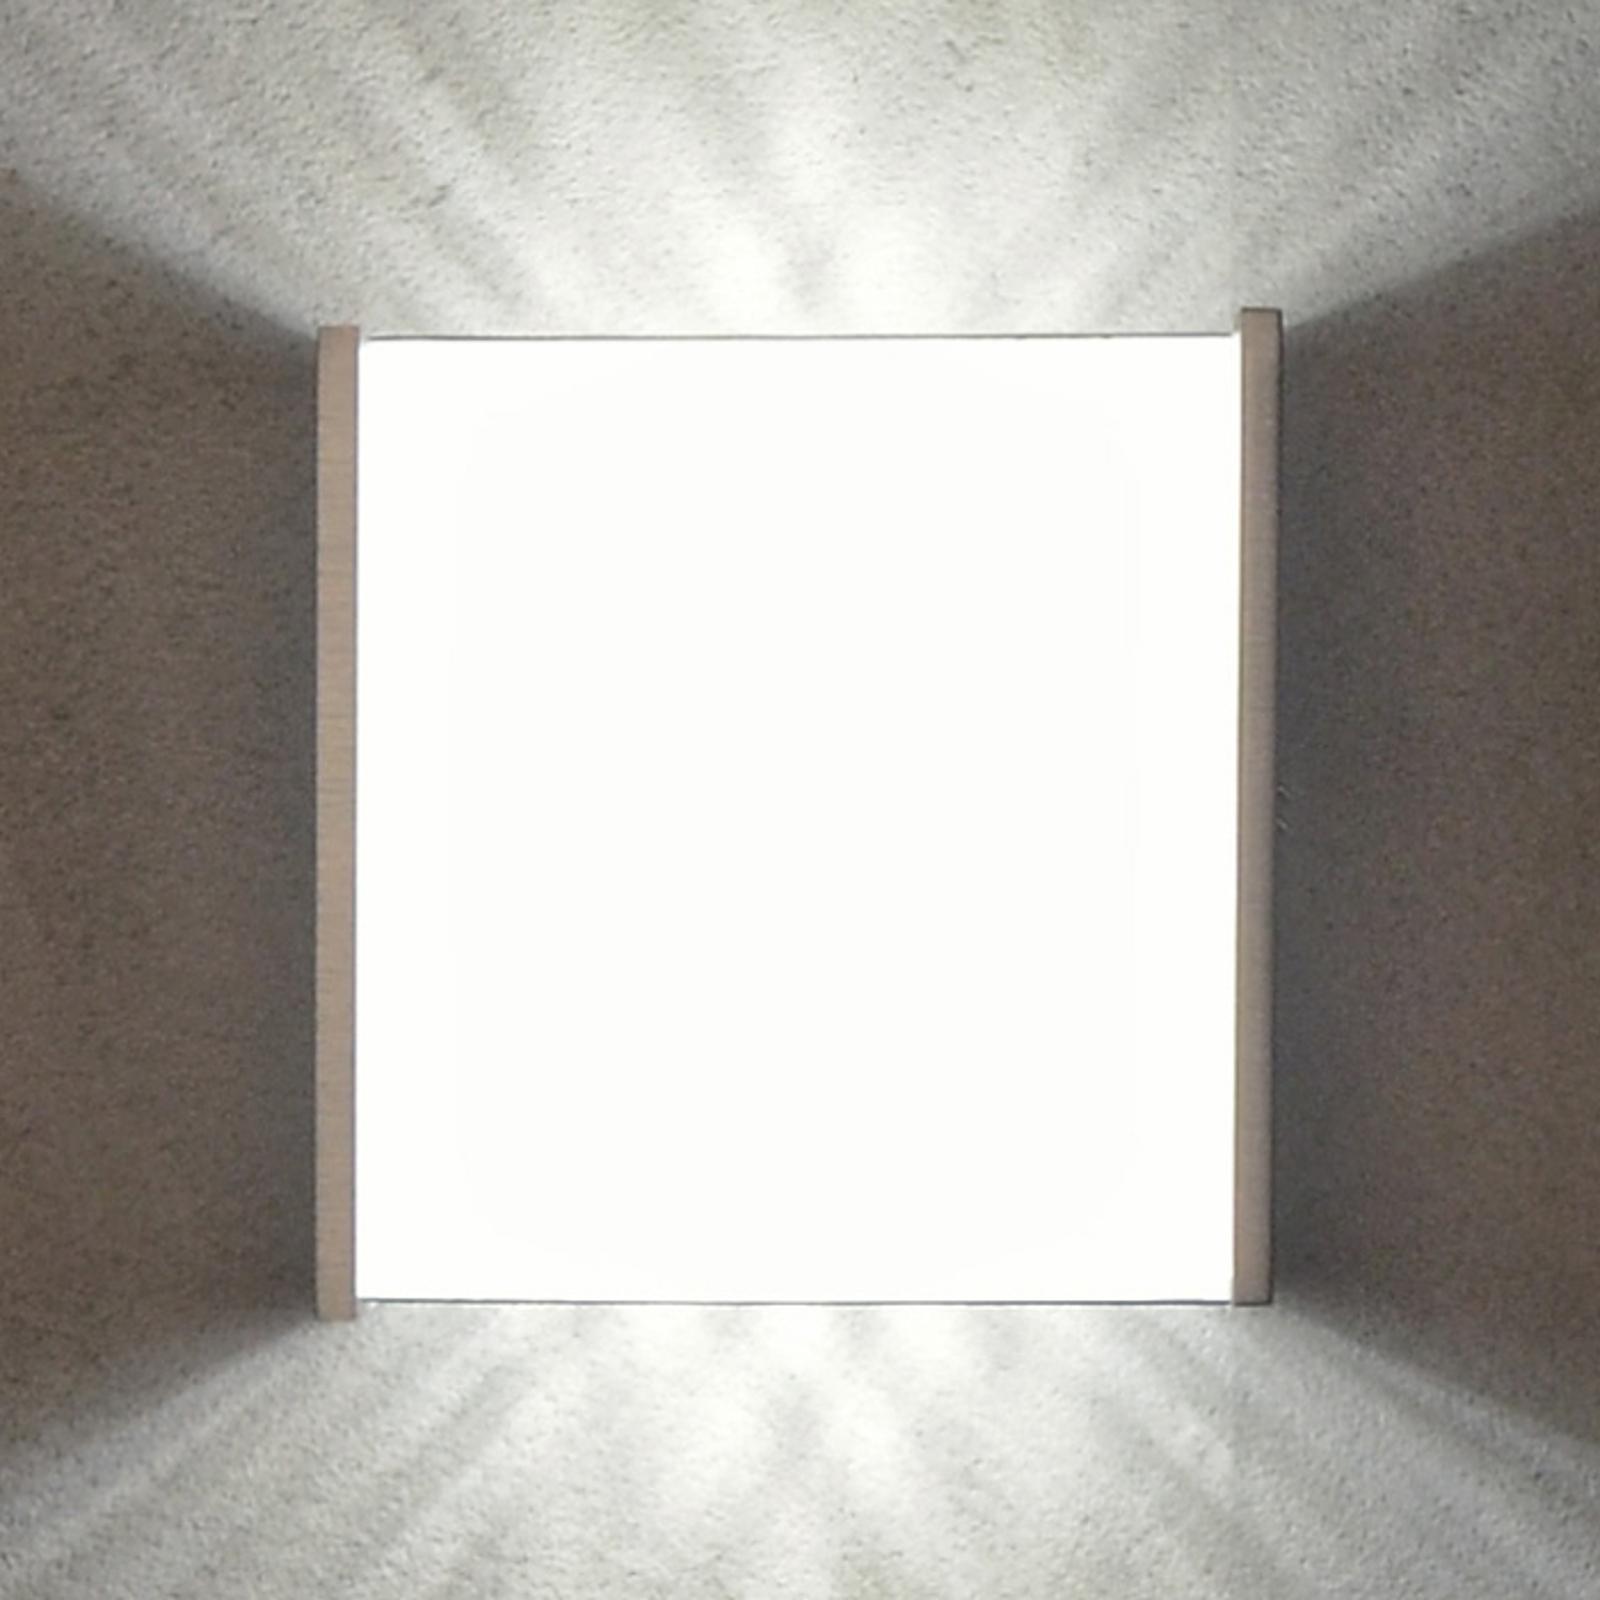 Effectvolle LED wandlamp Box